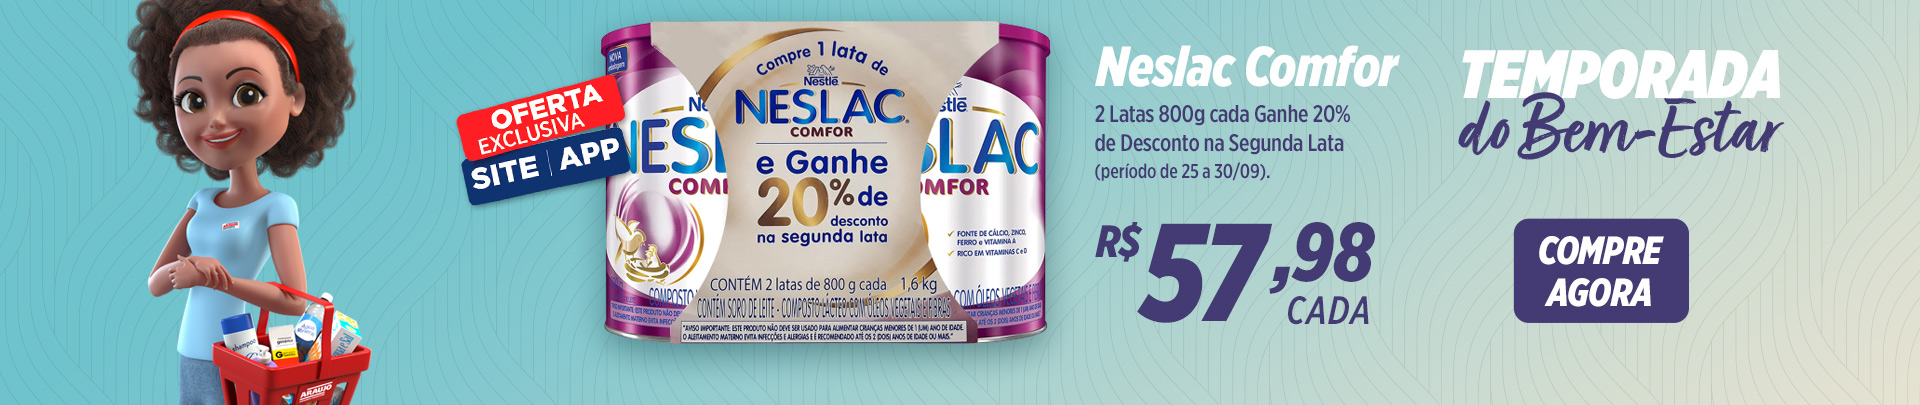 Neslac_BemEStar